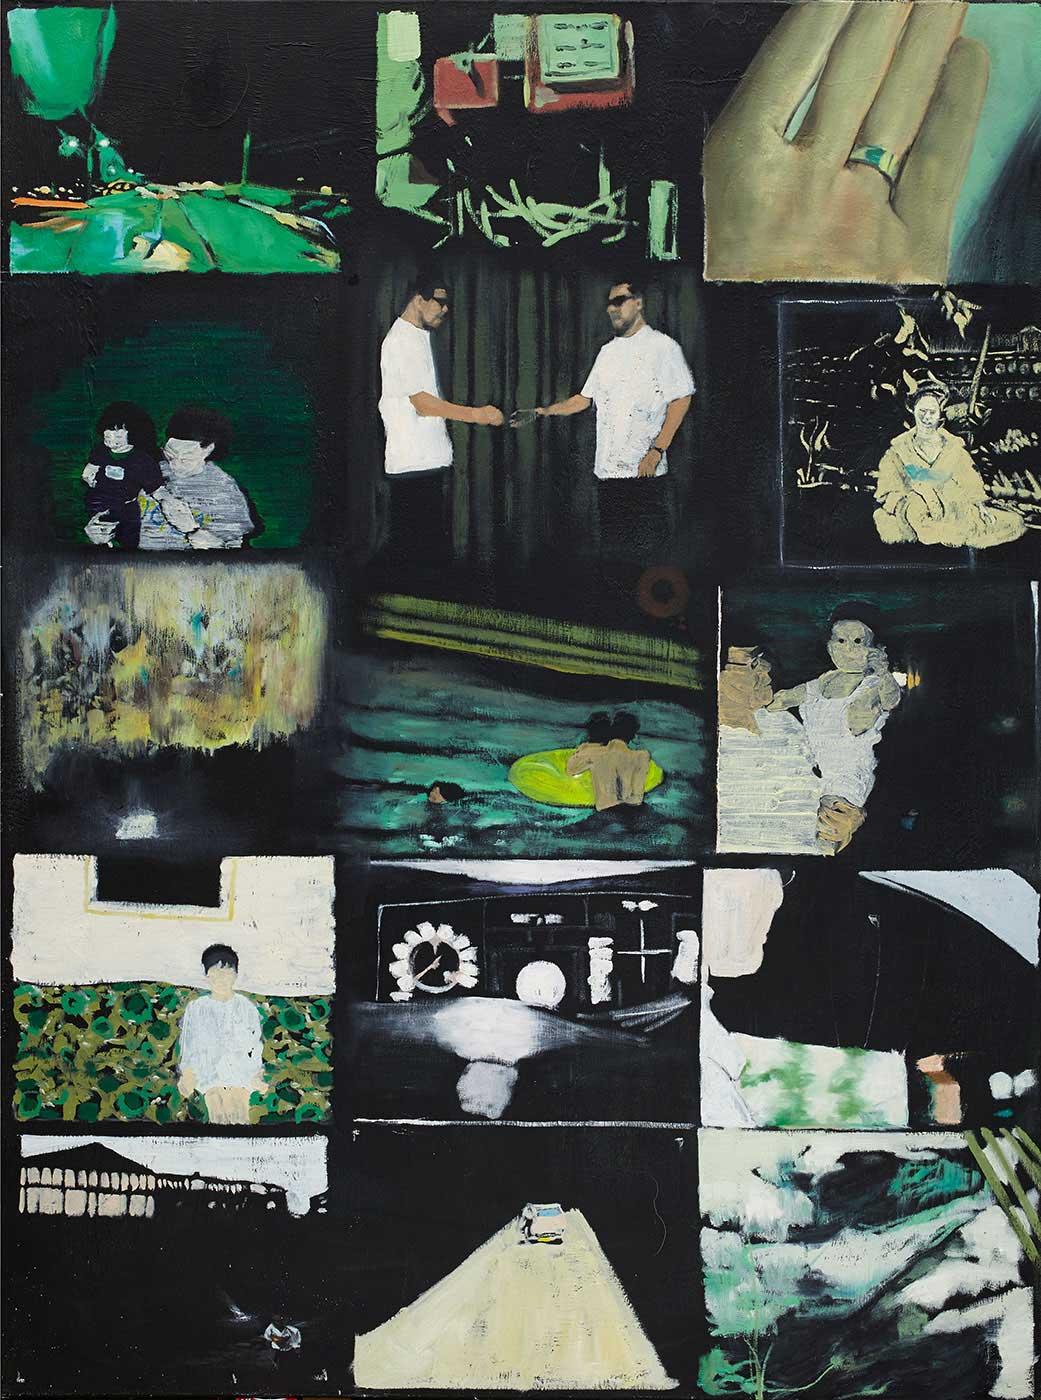 Paul J. Guzman - Untitled I